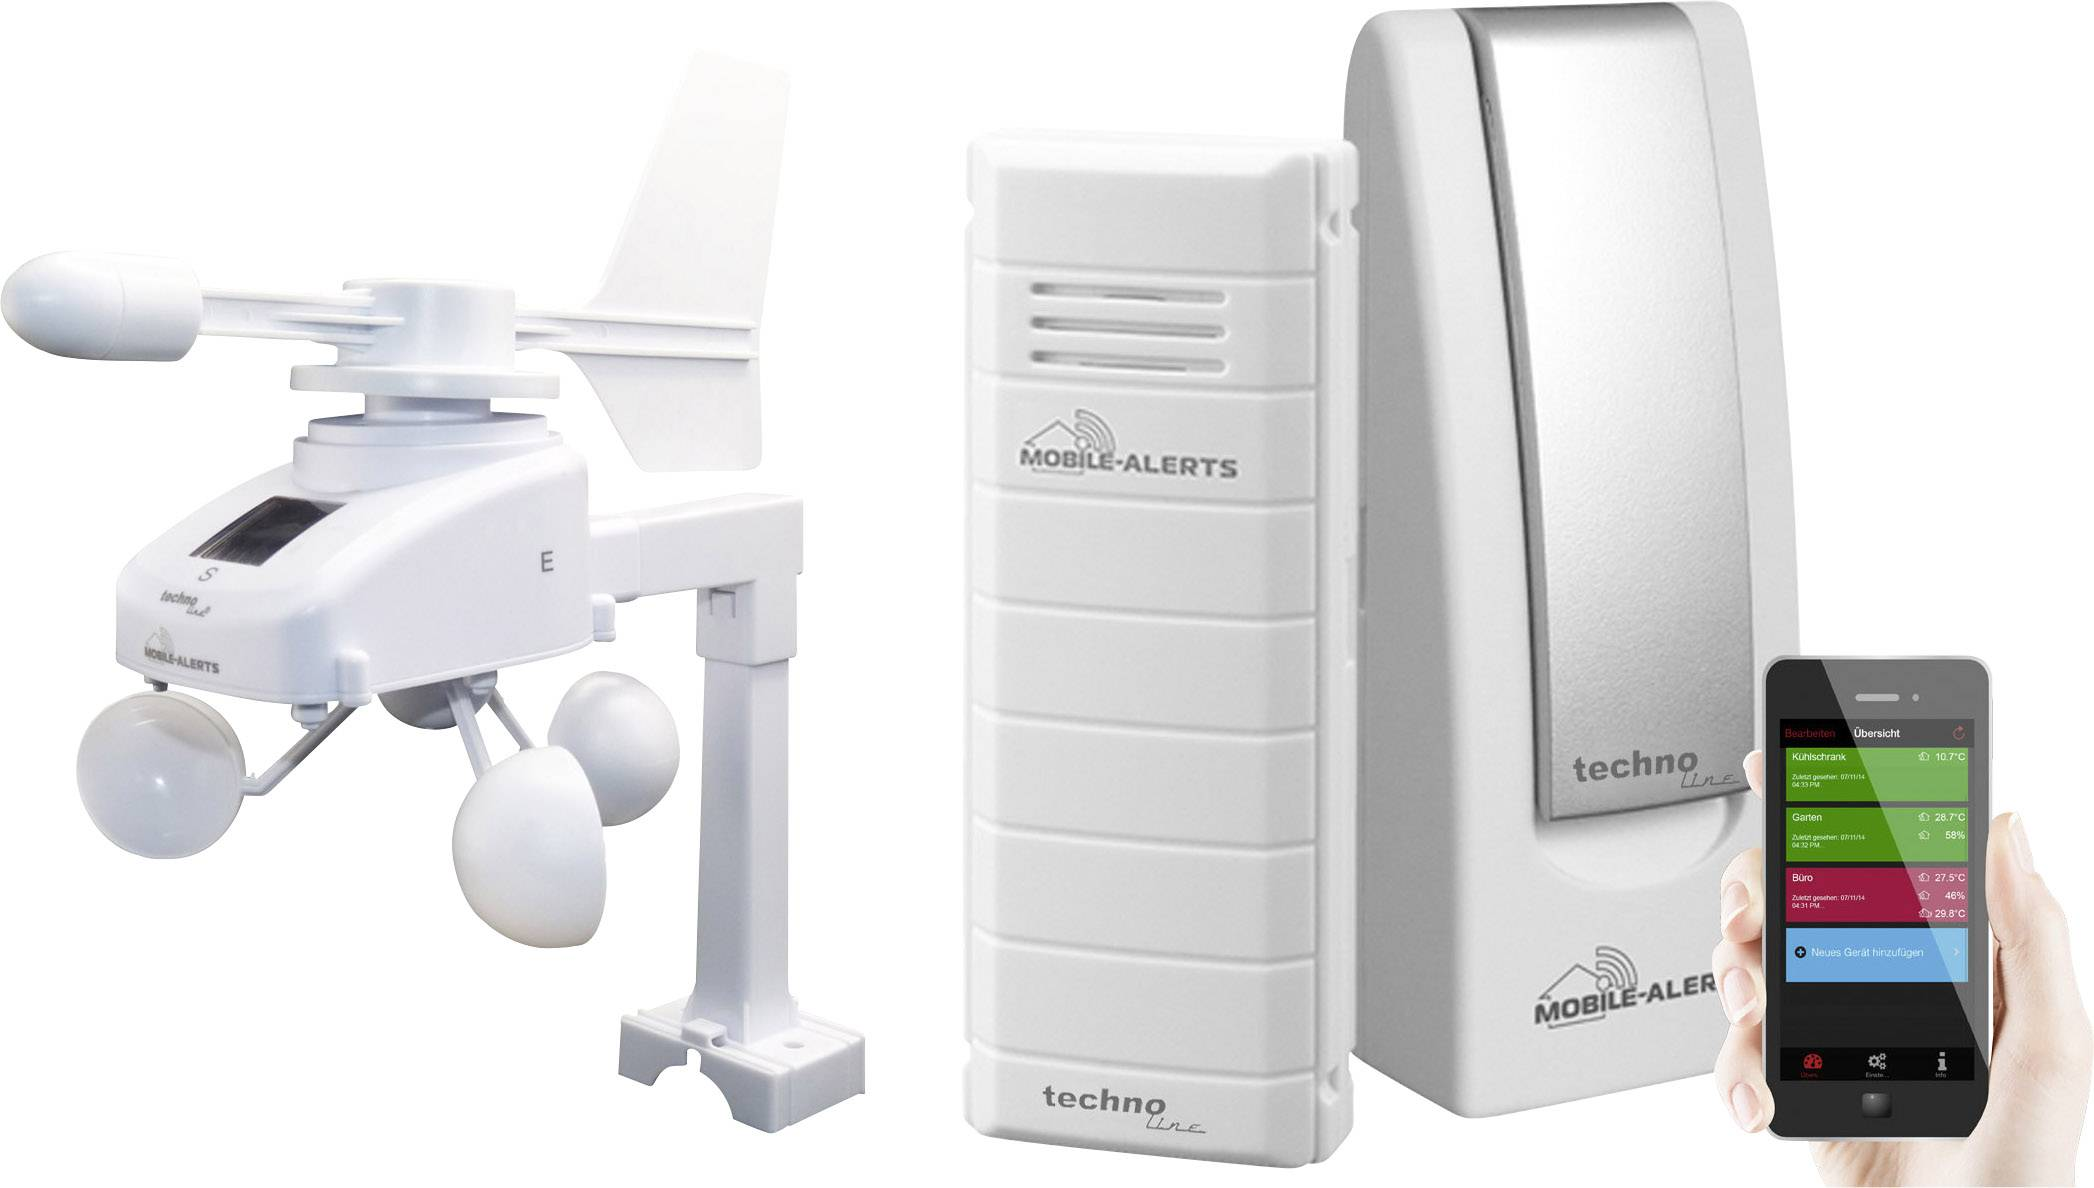 Digitálna bezdrôtová meteostanica Techno Line Mobile Alerts MA 10045, Max. dosah 100 m, biela